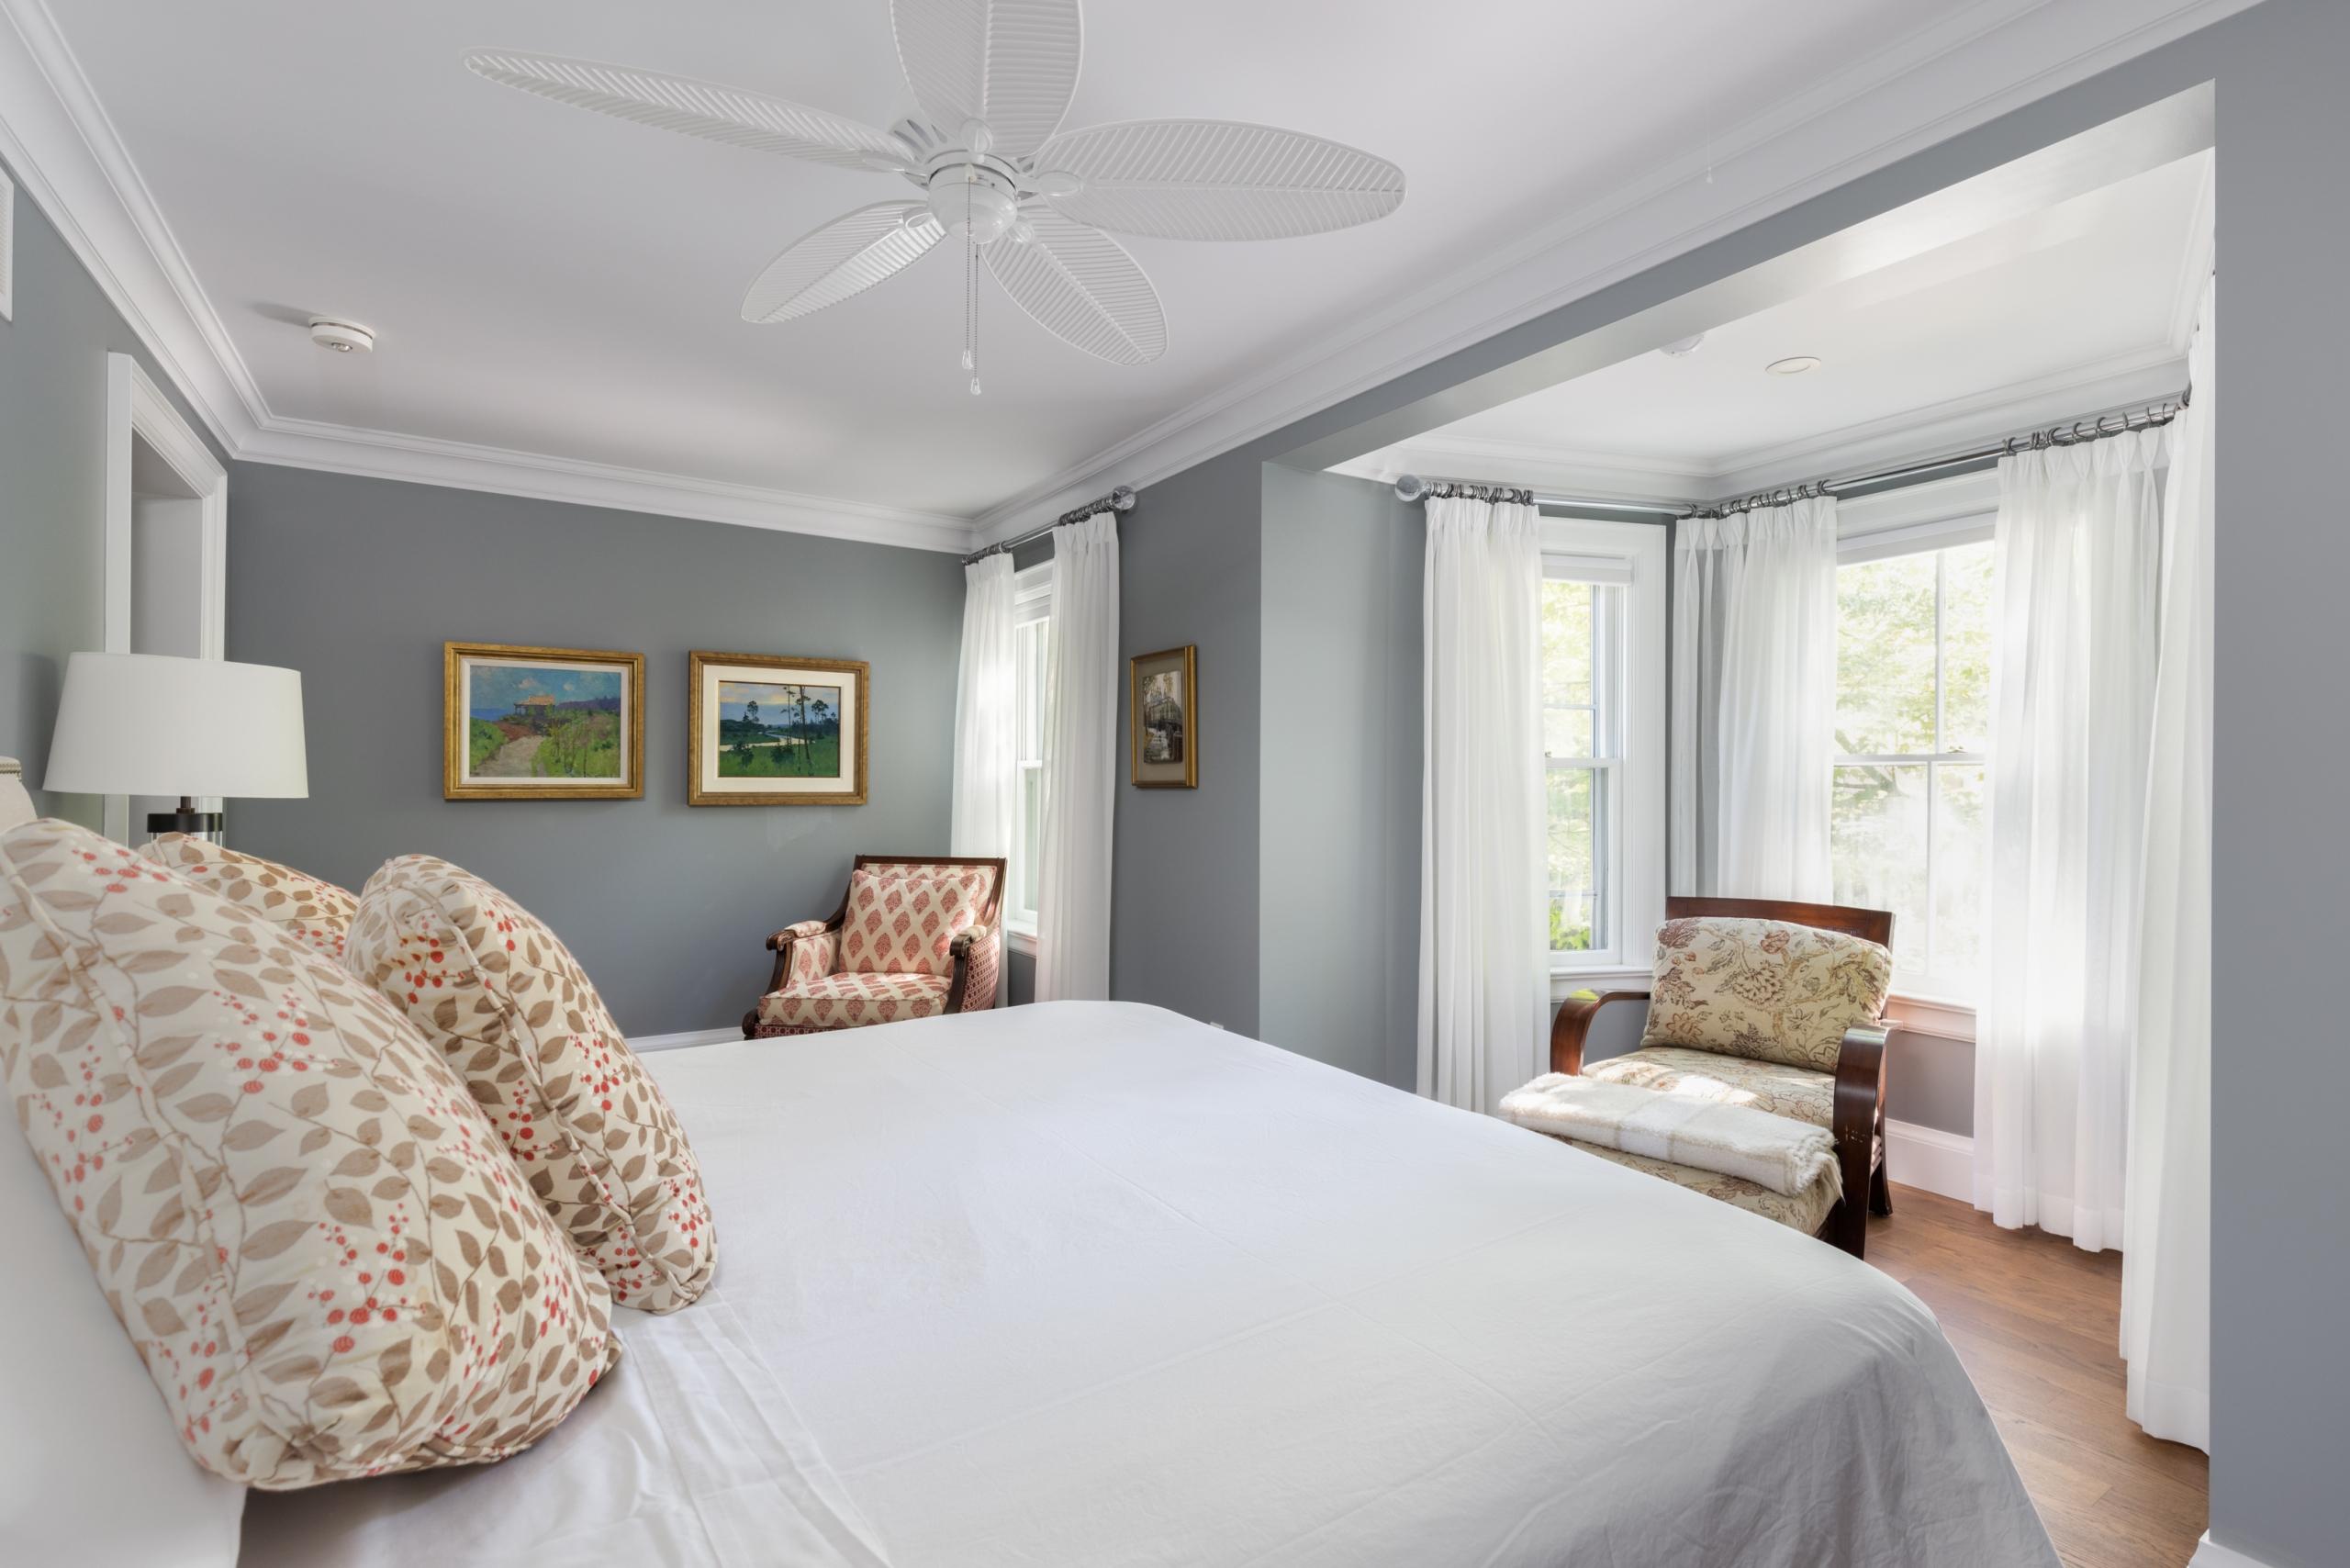 Bedroom featured at 295 William Street, Oakville. Alex Irish & Associates